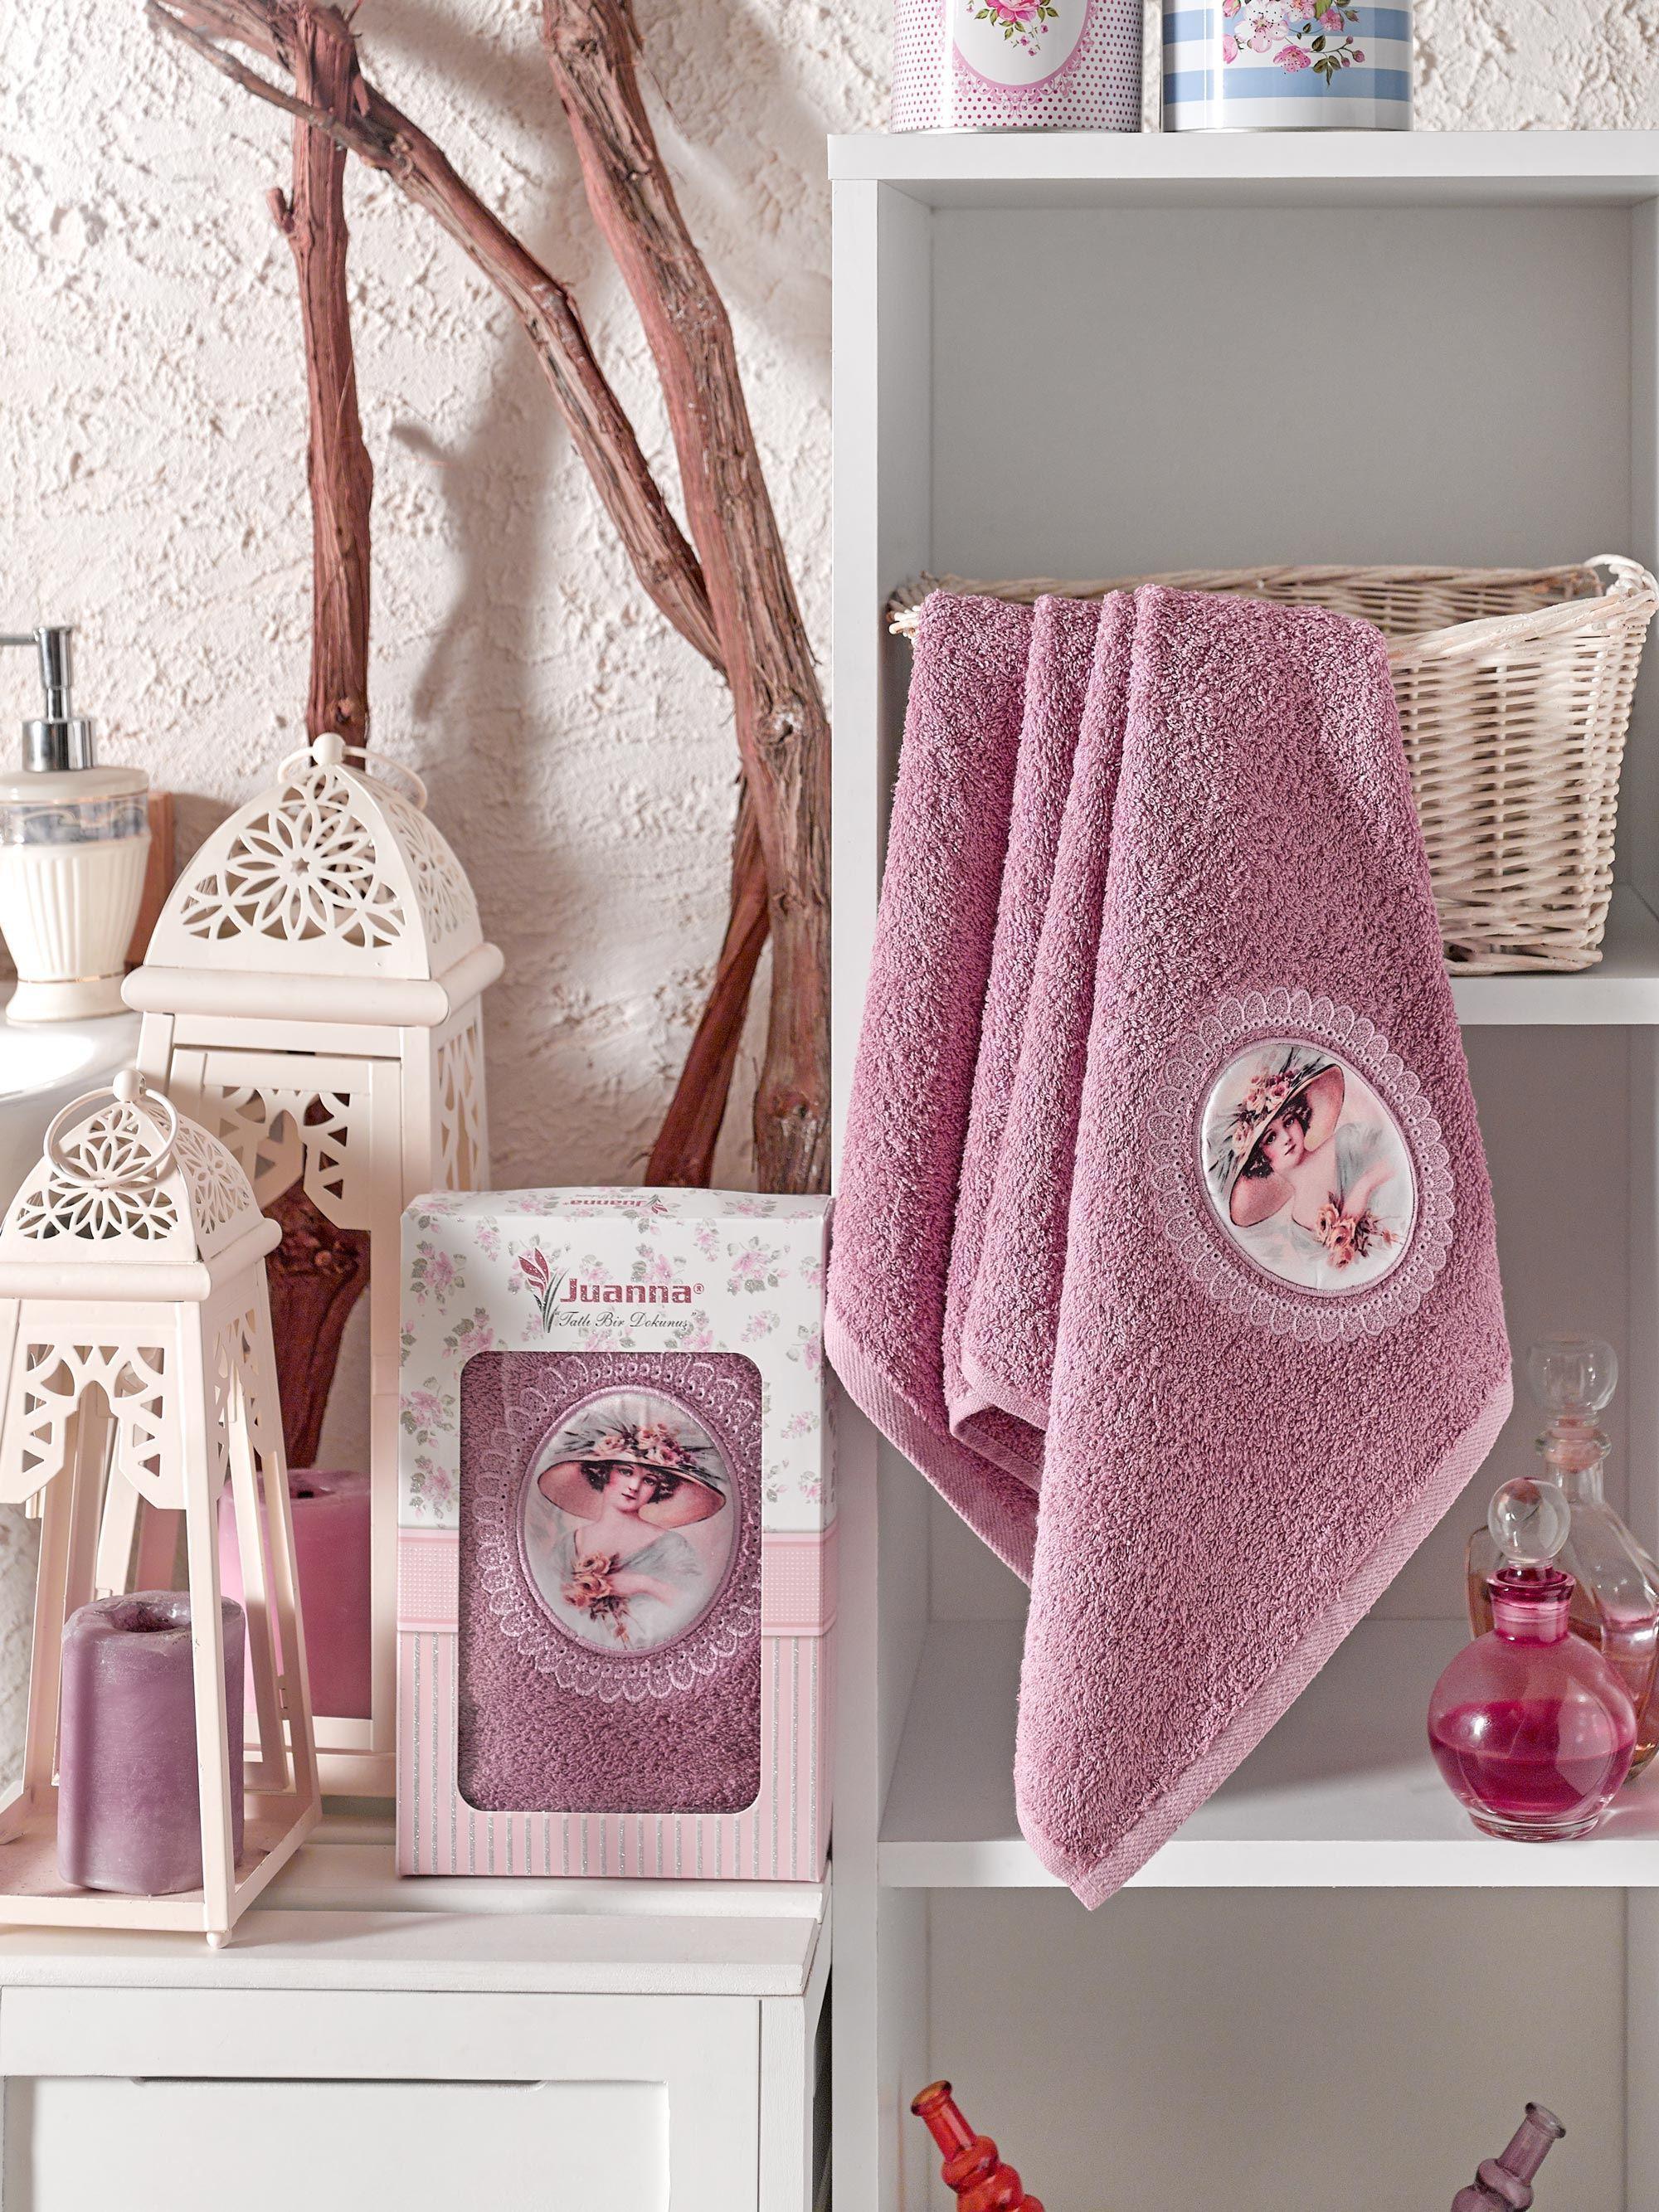 Полотенца Juanna Полотенце Lady Цвет: Баклажан (50х90 см) полотенца do n co полотенце lady цвет мятный набор